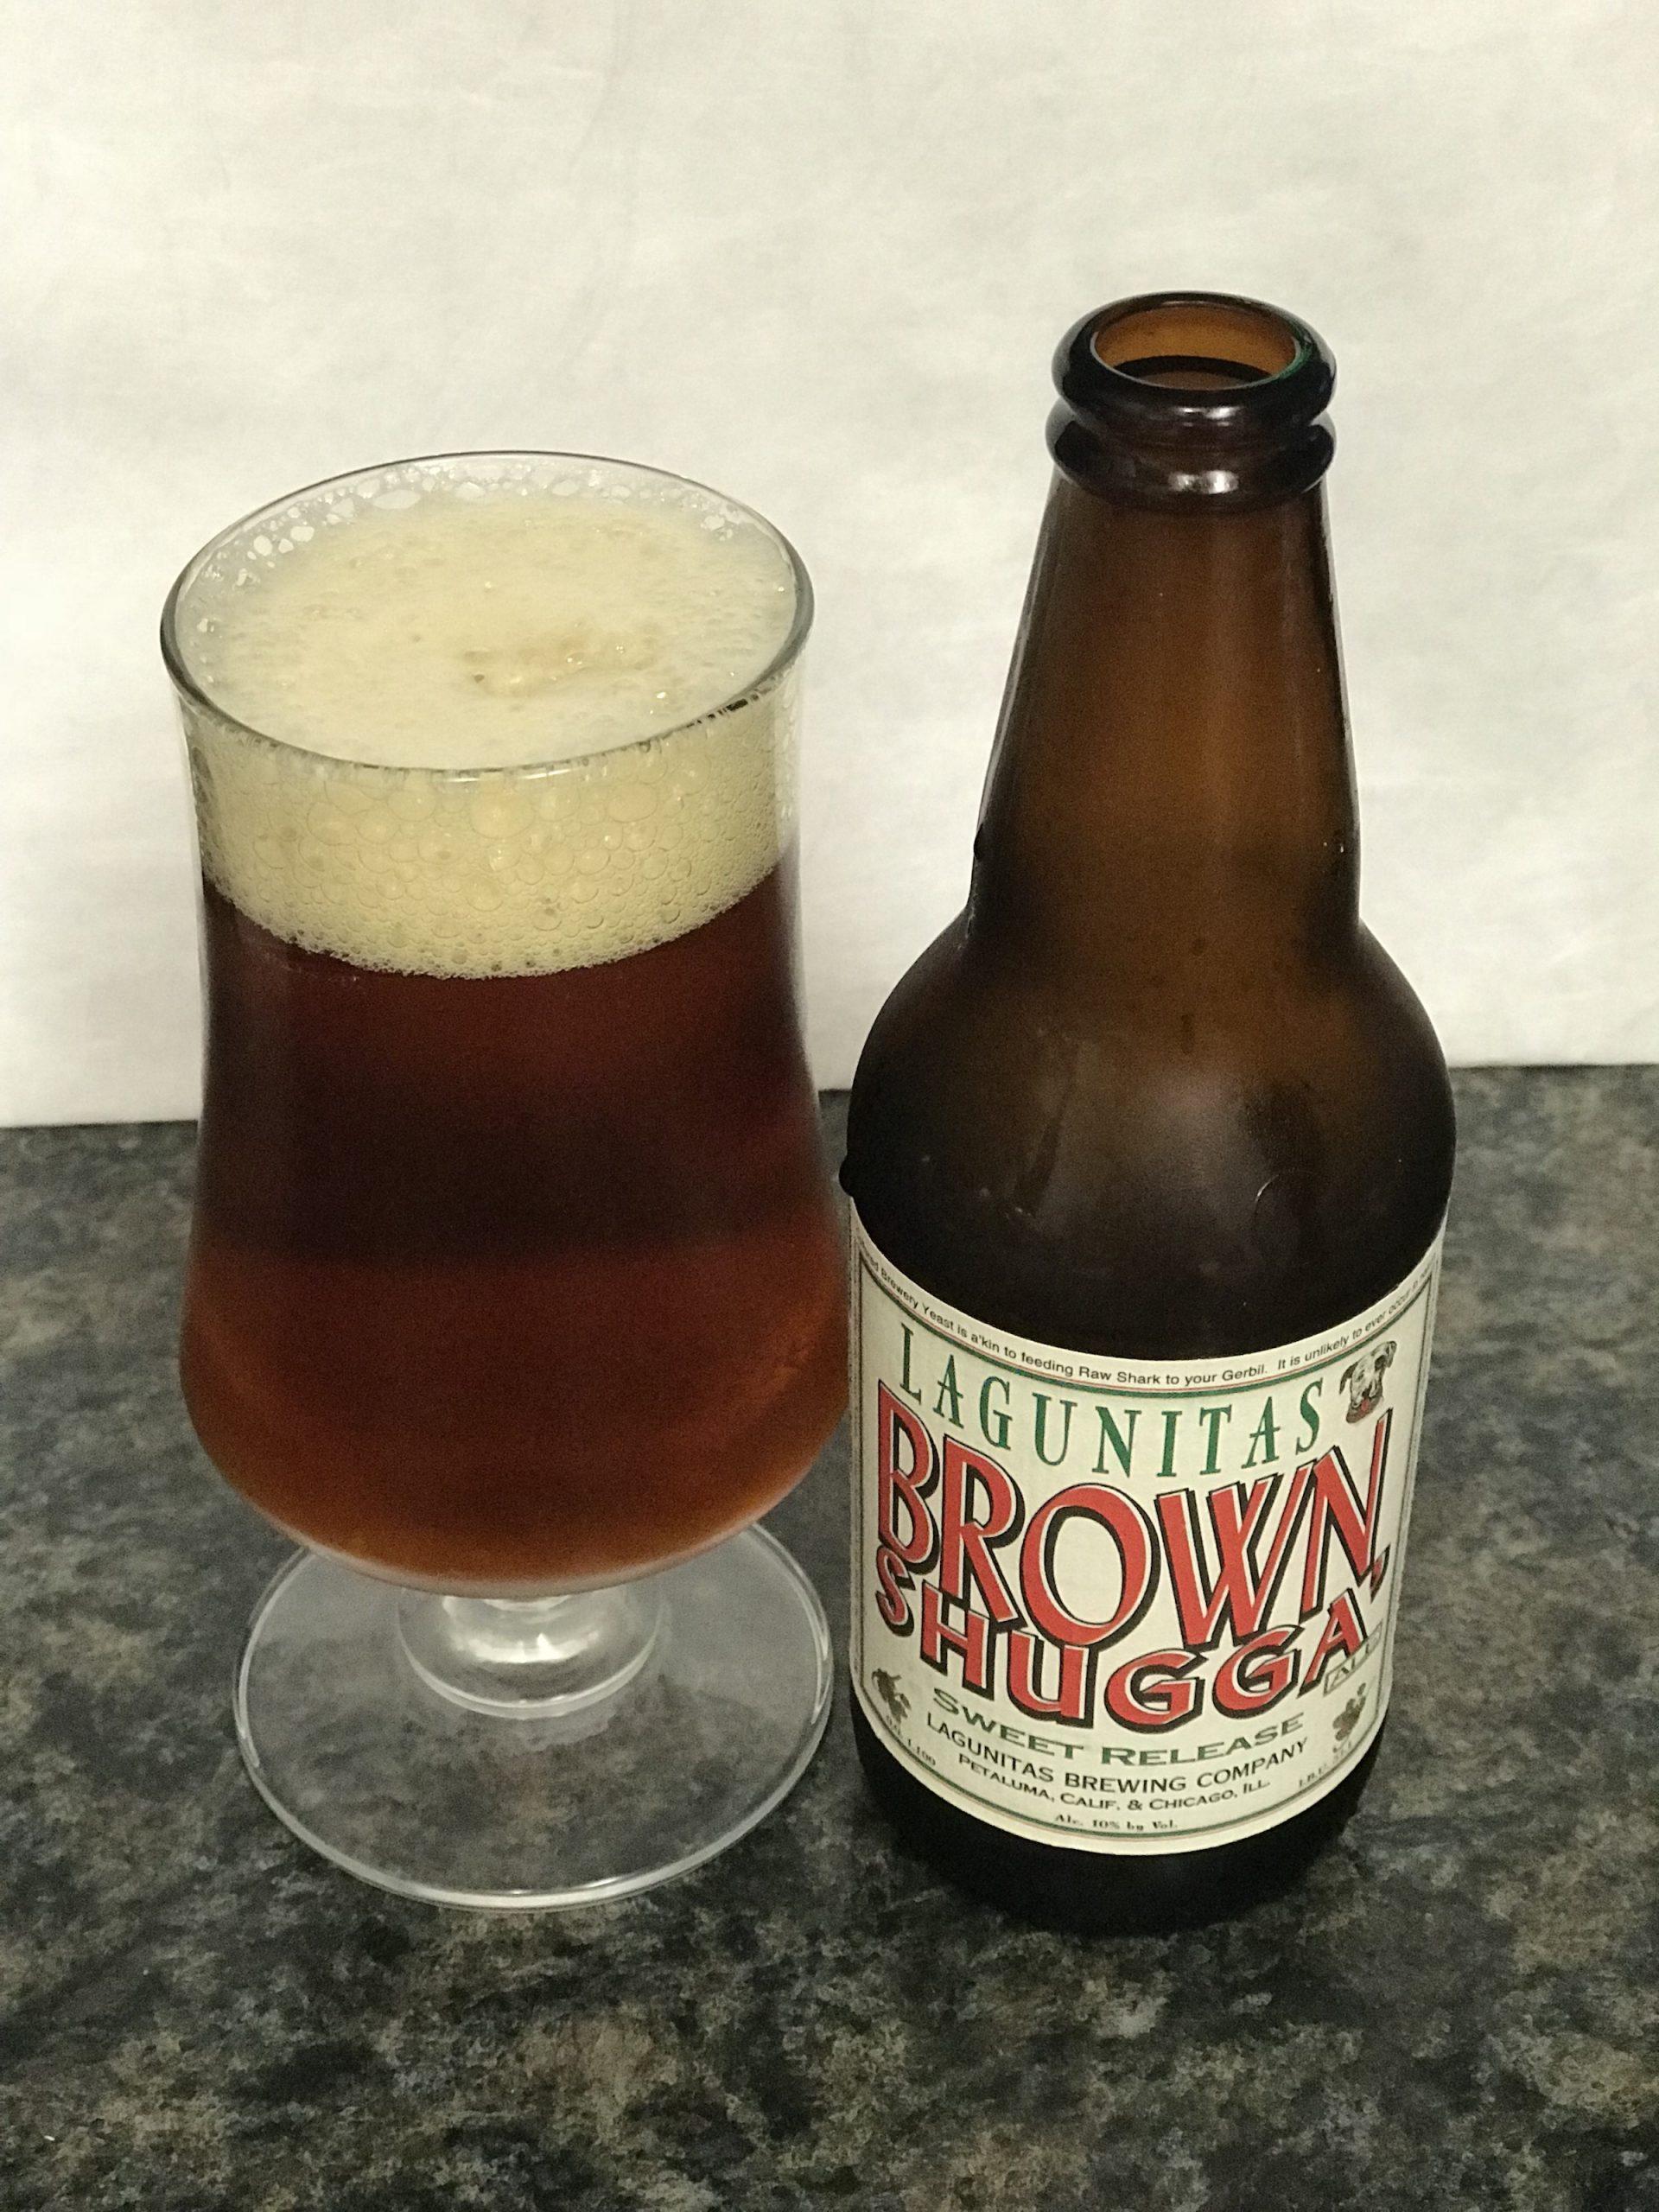 Brown Shugga by Lagunitas Brewing Company